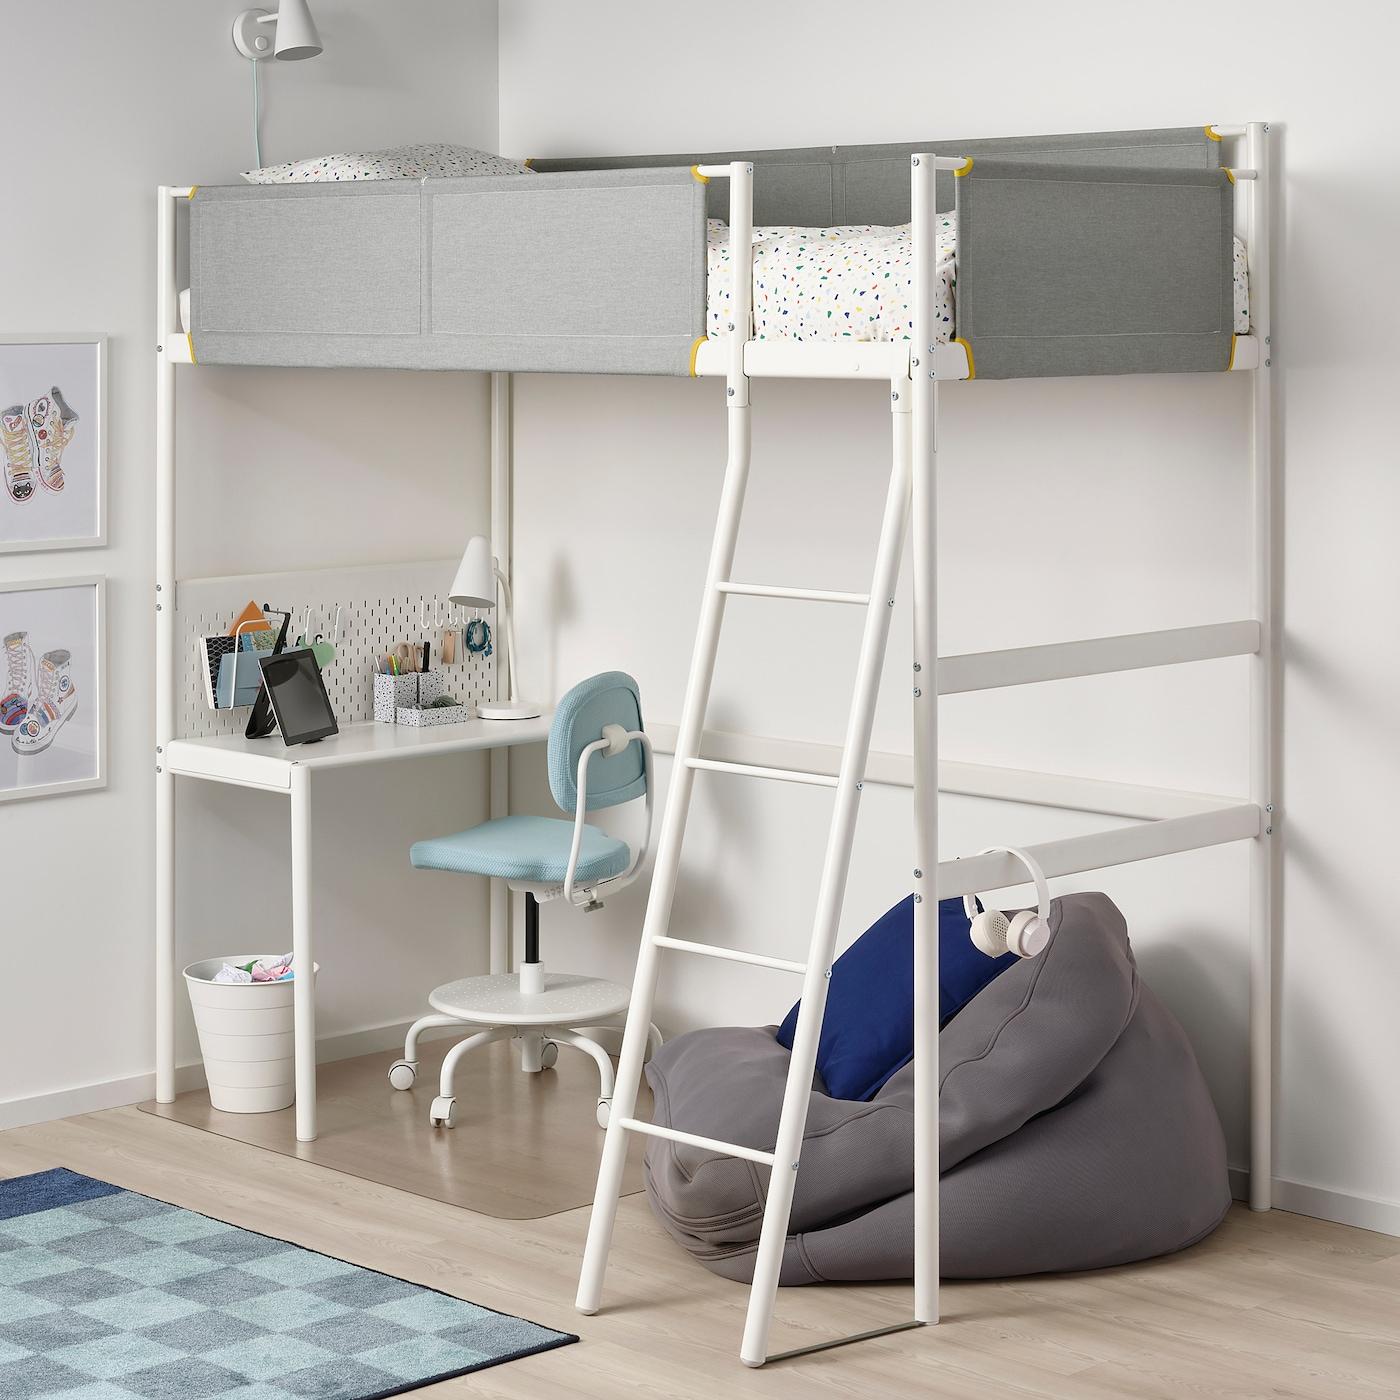 Vitval Estructura Cama Alta Escritorio Blanco Gris Claro 90x200 Cm Ikea